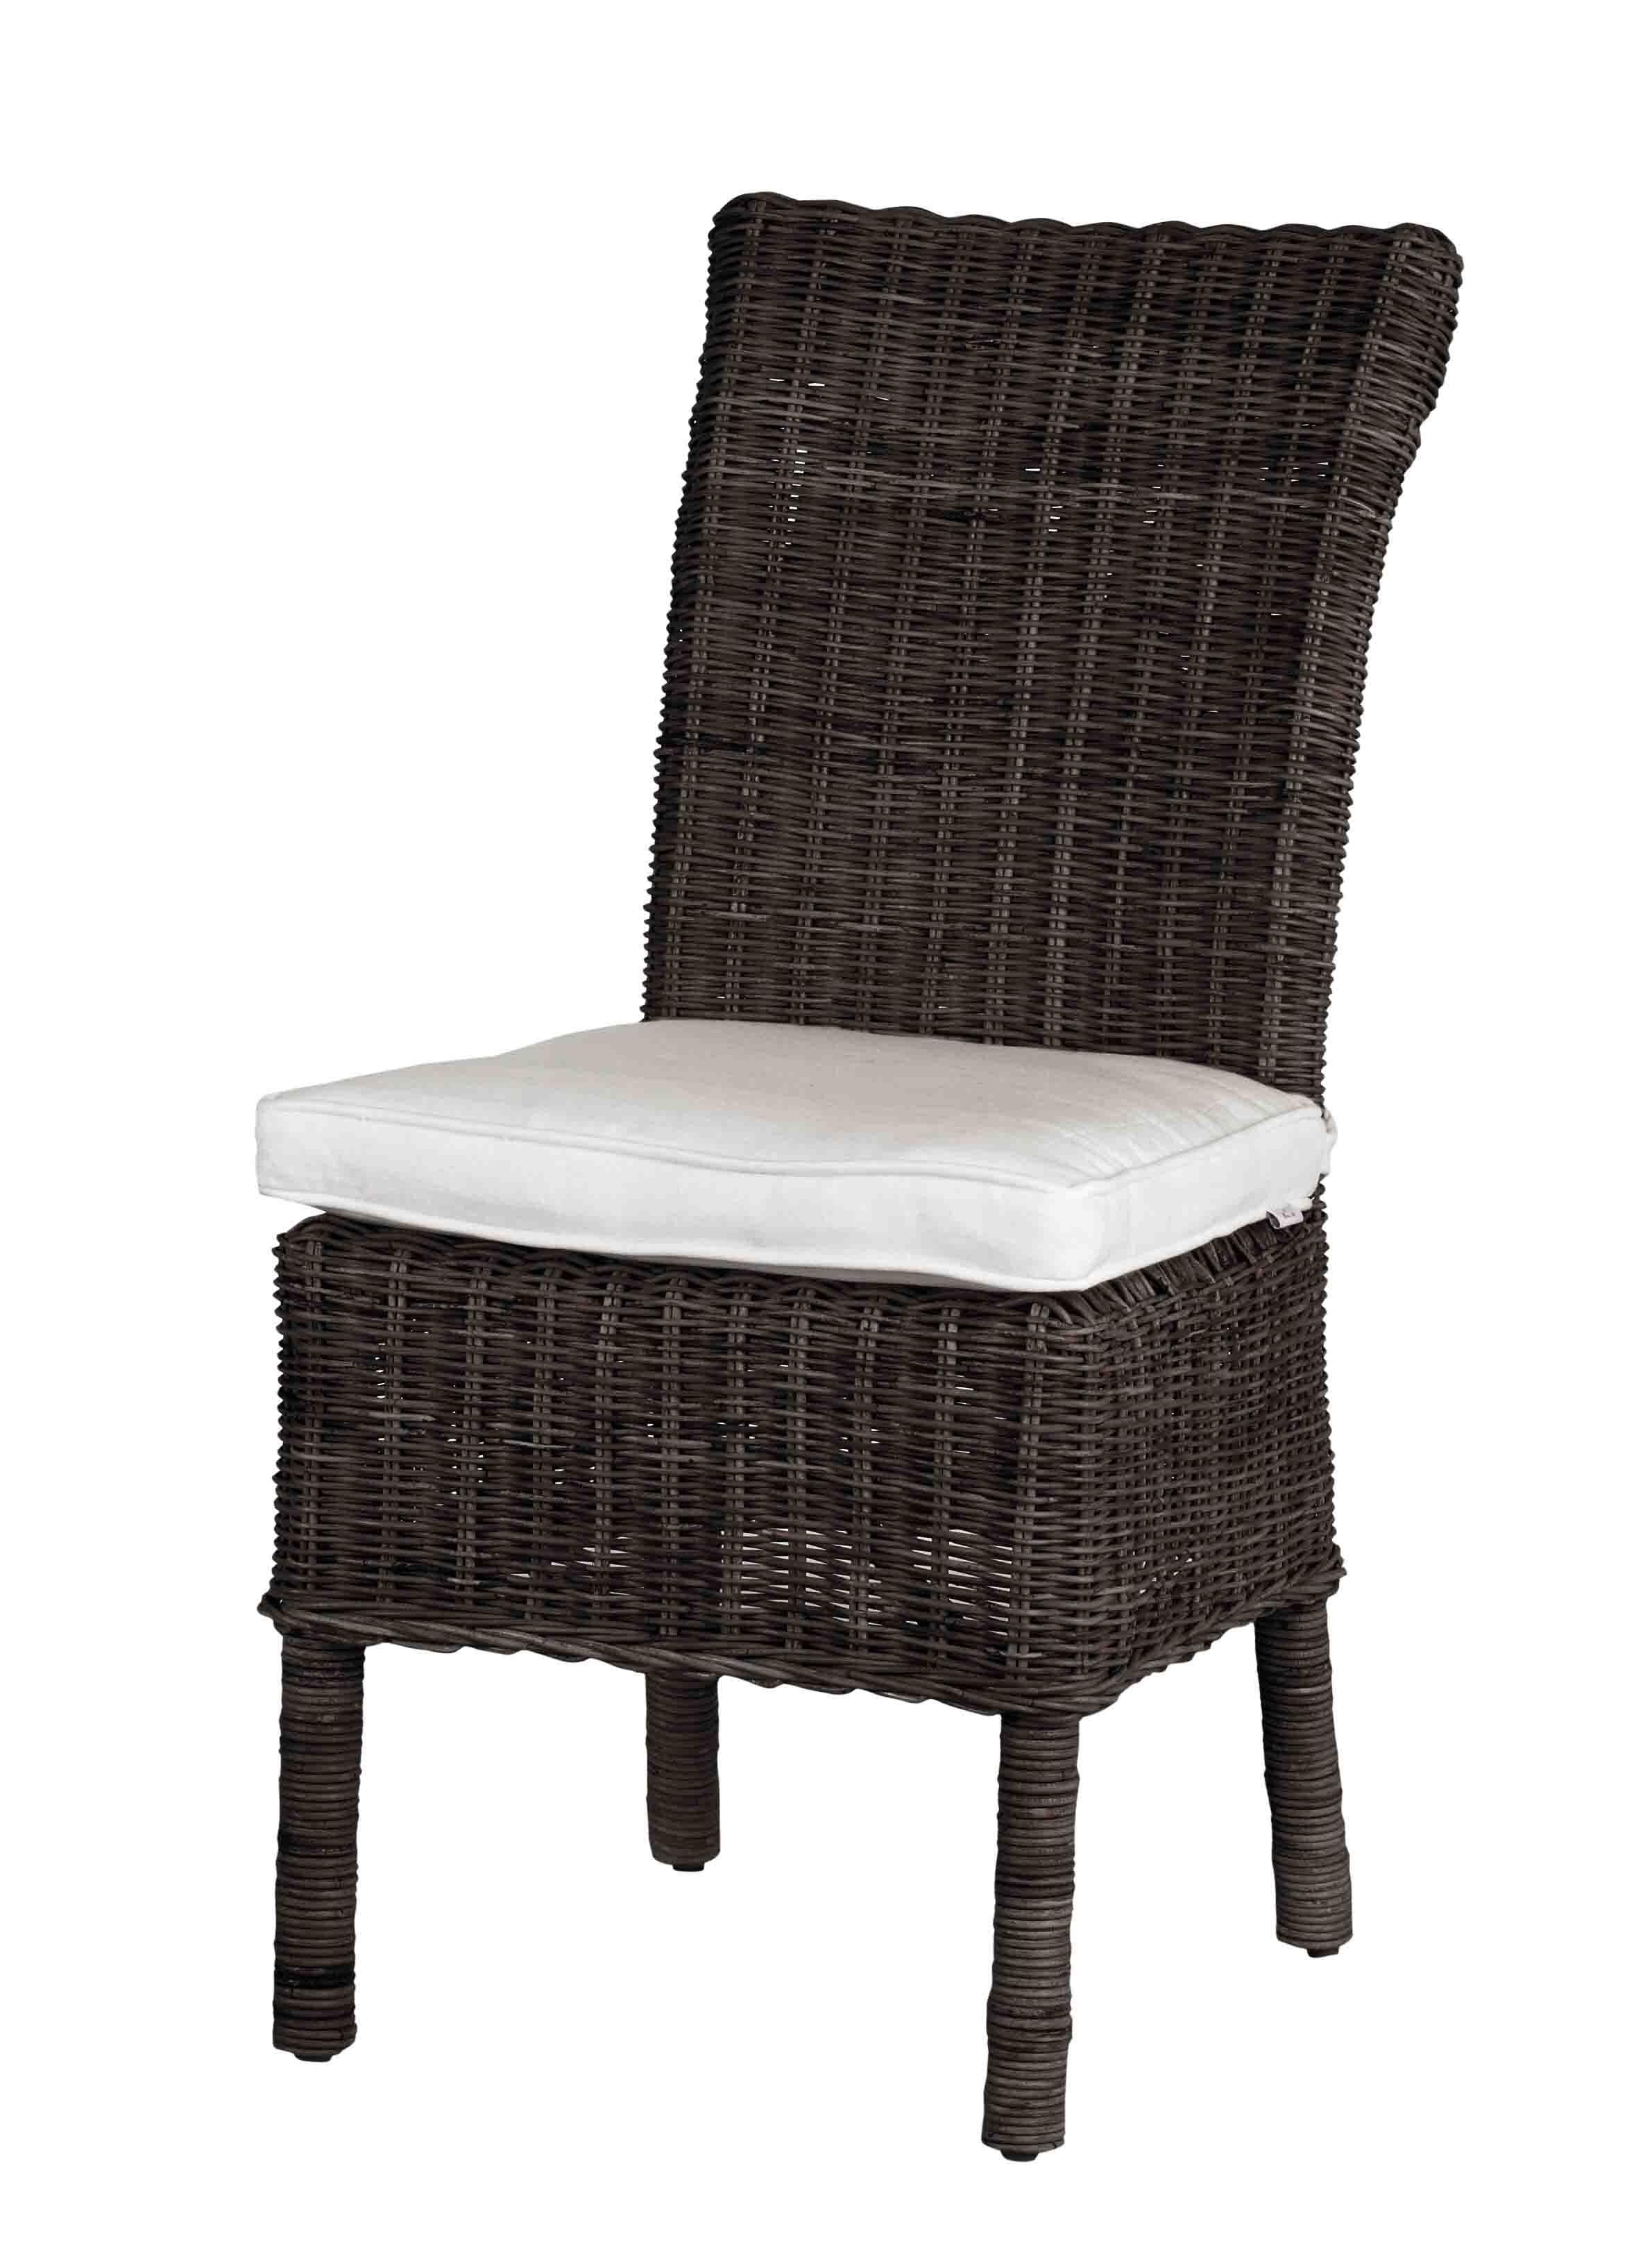 Fara Outdoor Dining Chair Artwood